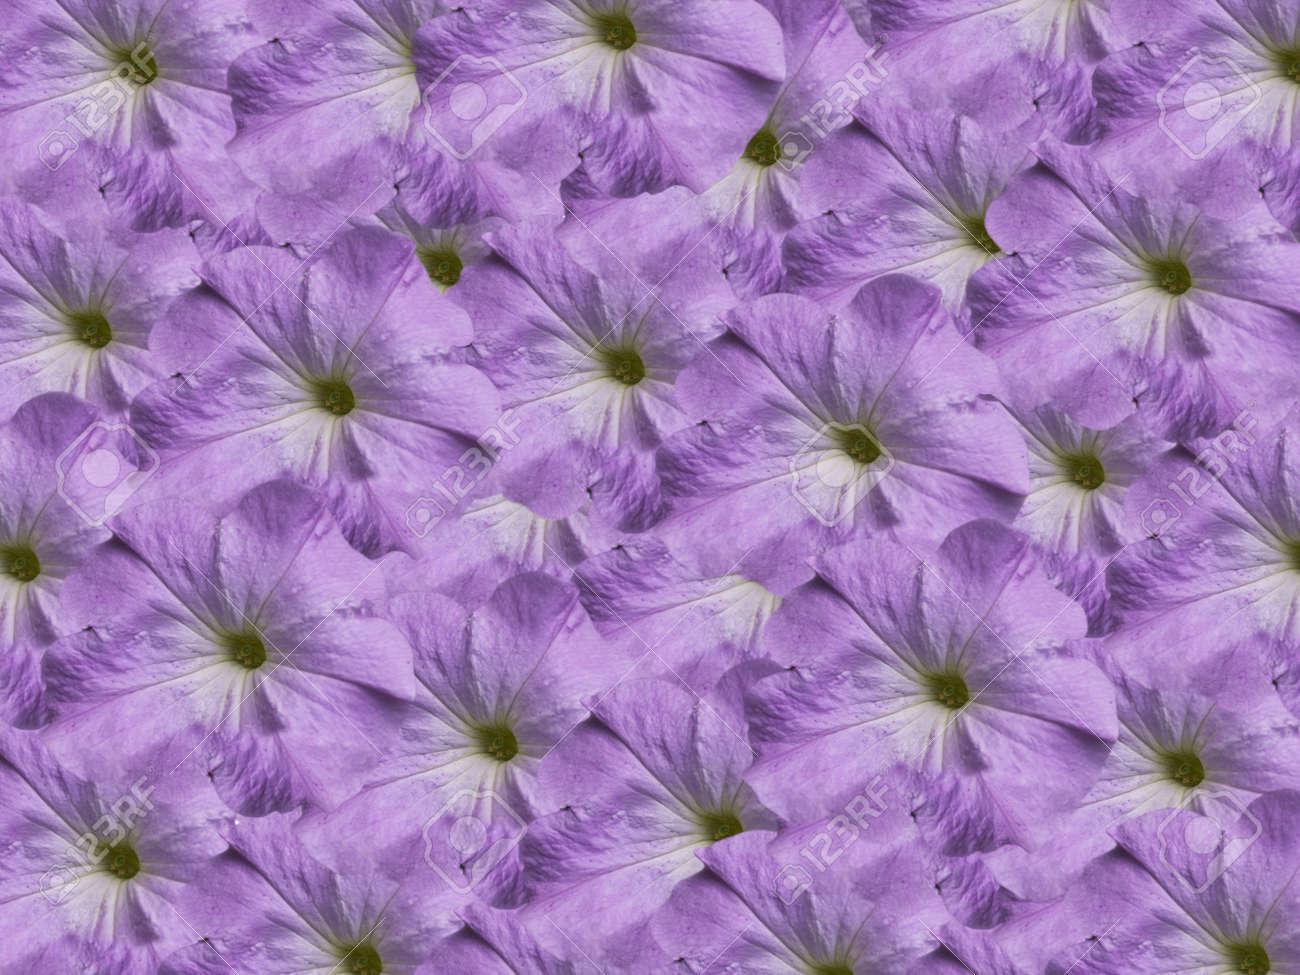 Purple Floral Wallpaper Petunia Backdrop Stock Photo